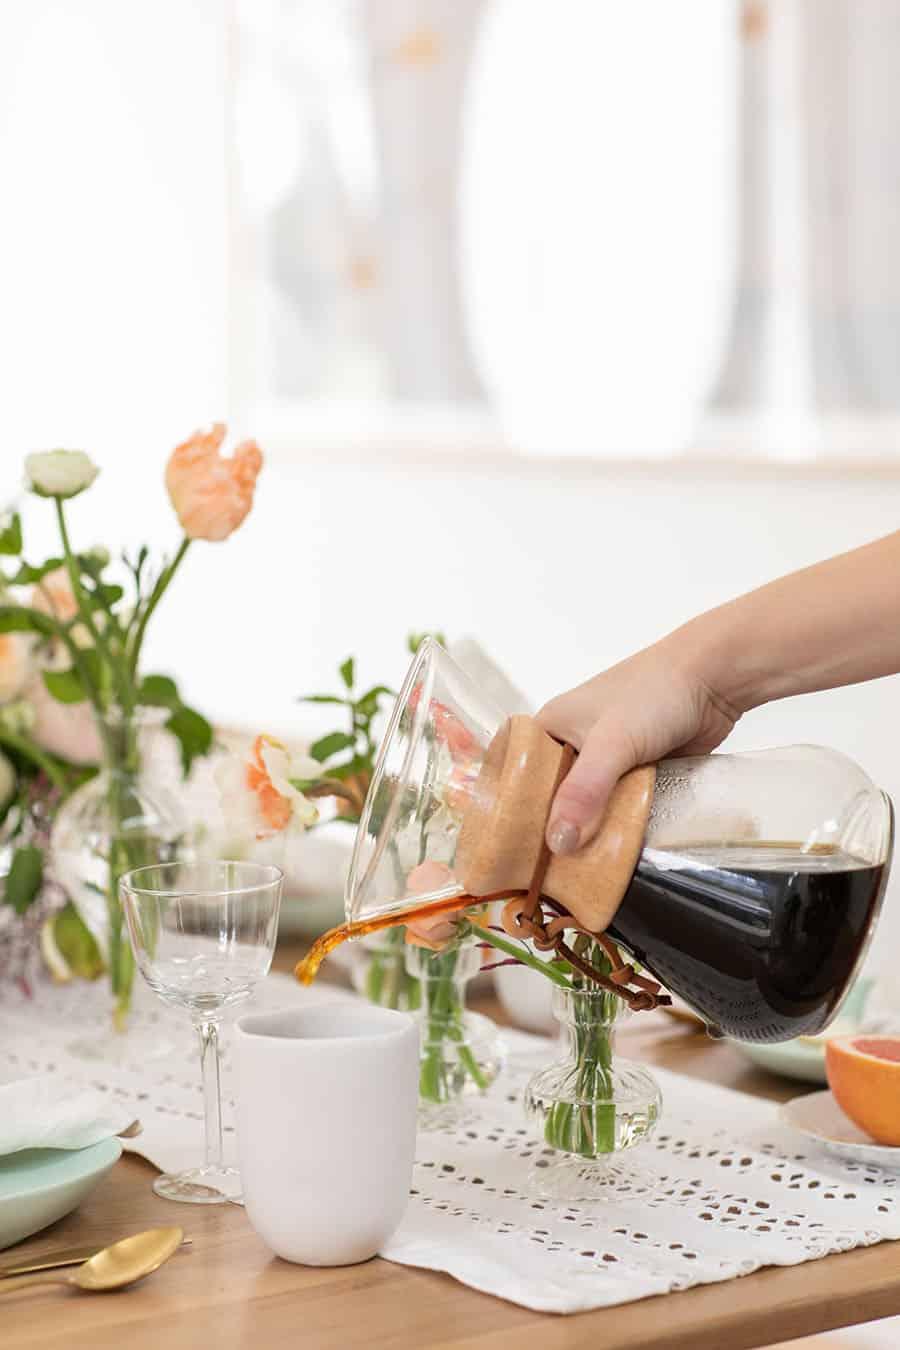 Eden Passante pouring coffee into a coffee mug.